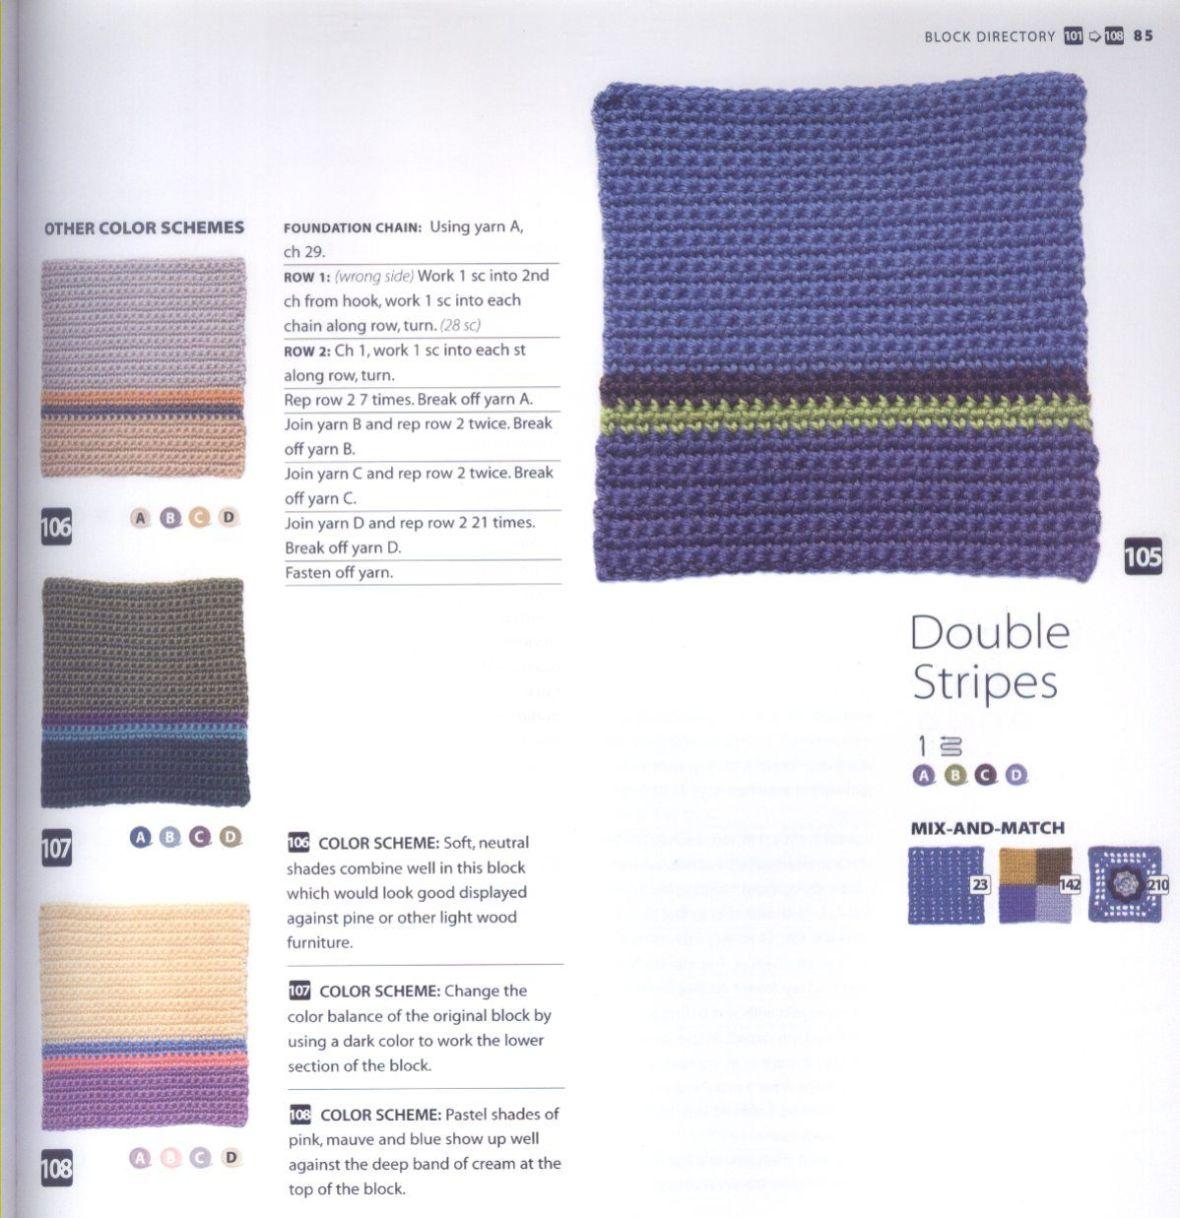 200 Crocheted Blocks for blankets, throws & Afghans 085